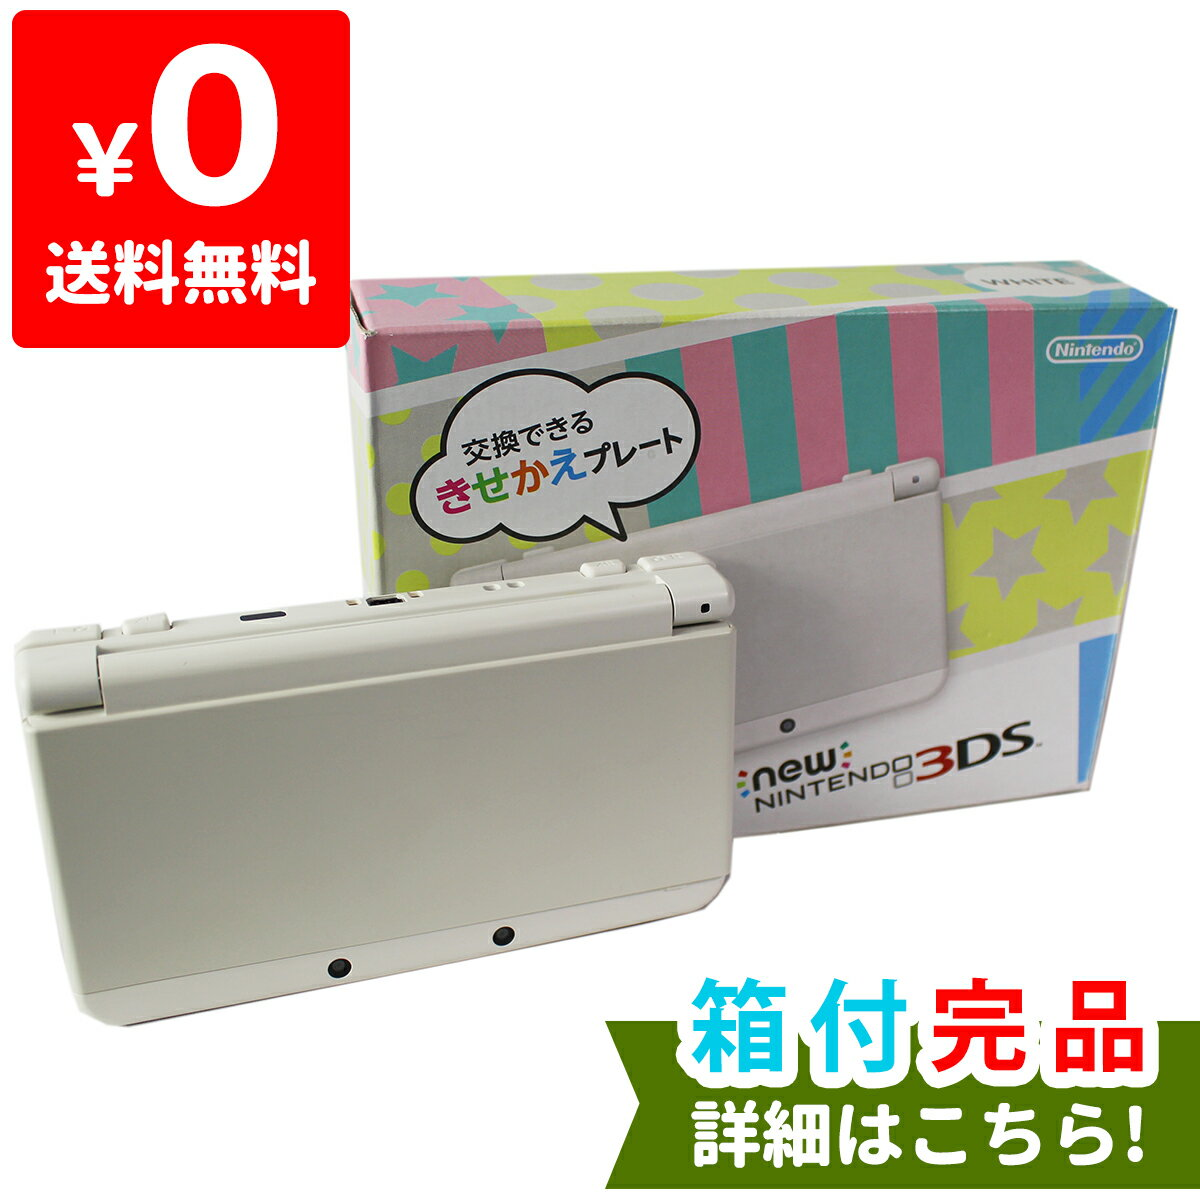 New3DS New ニンテンドー3DS ホワイト(KTR-S-WAAA) 本体 完品 外箱付き Nintendo 任天堂 ニンテンドー 中古 4902370522150 送料無料 【中古】